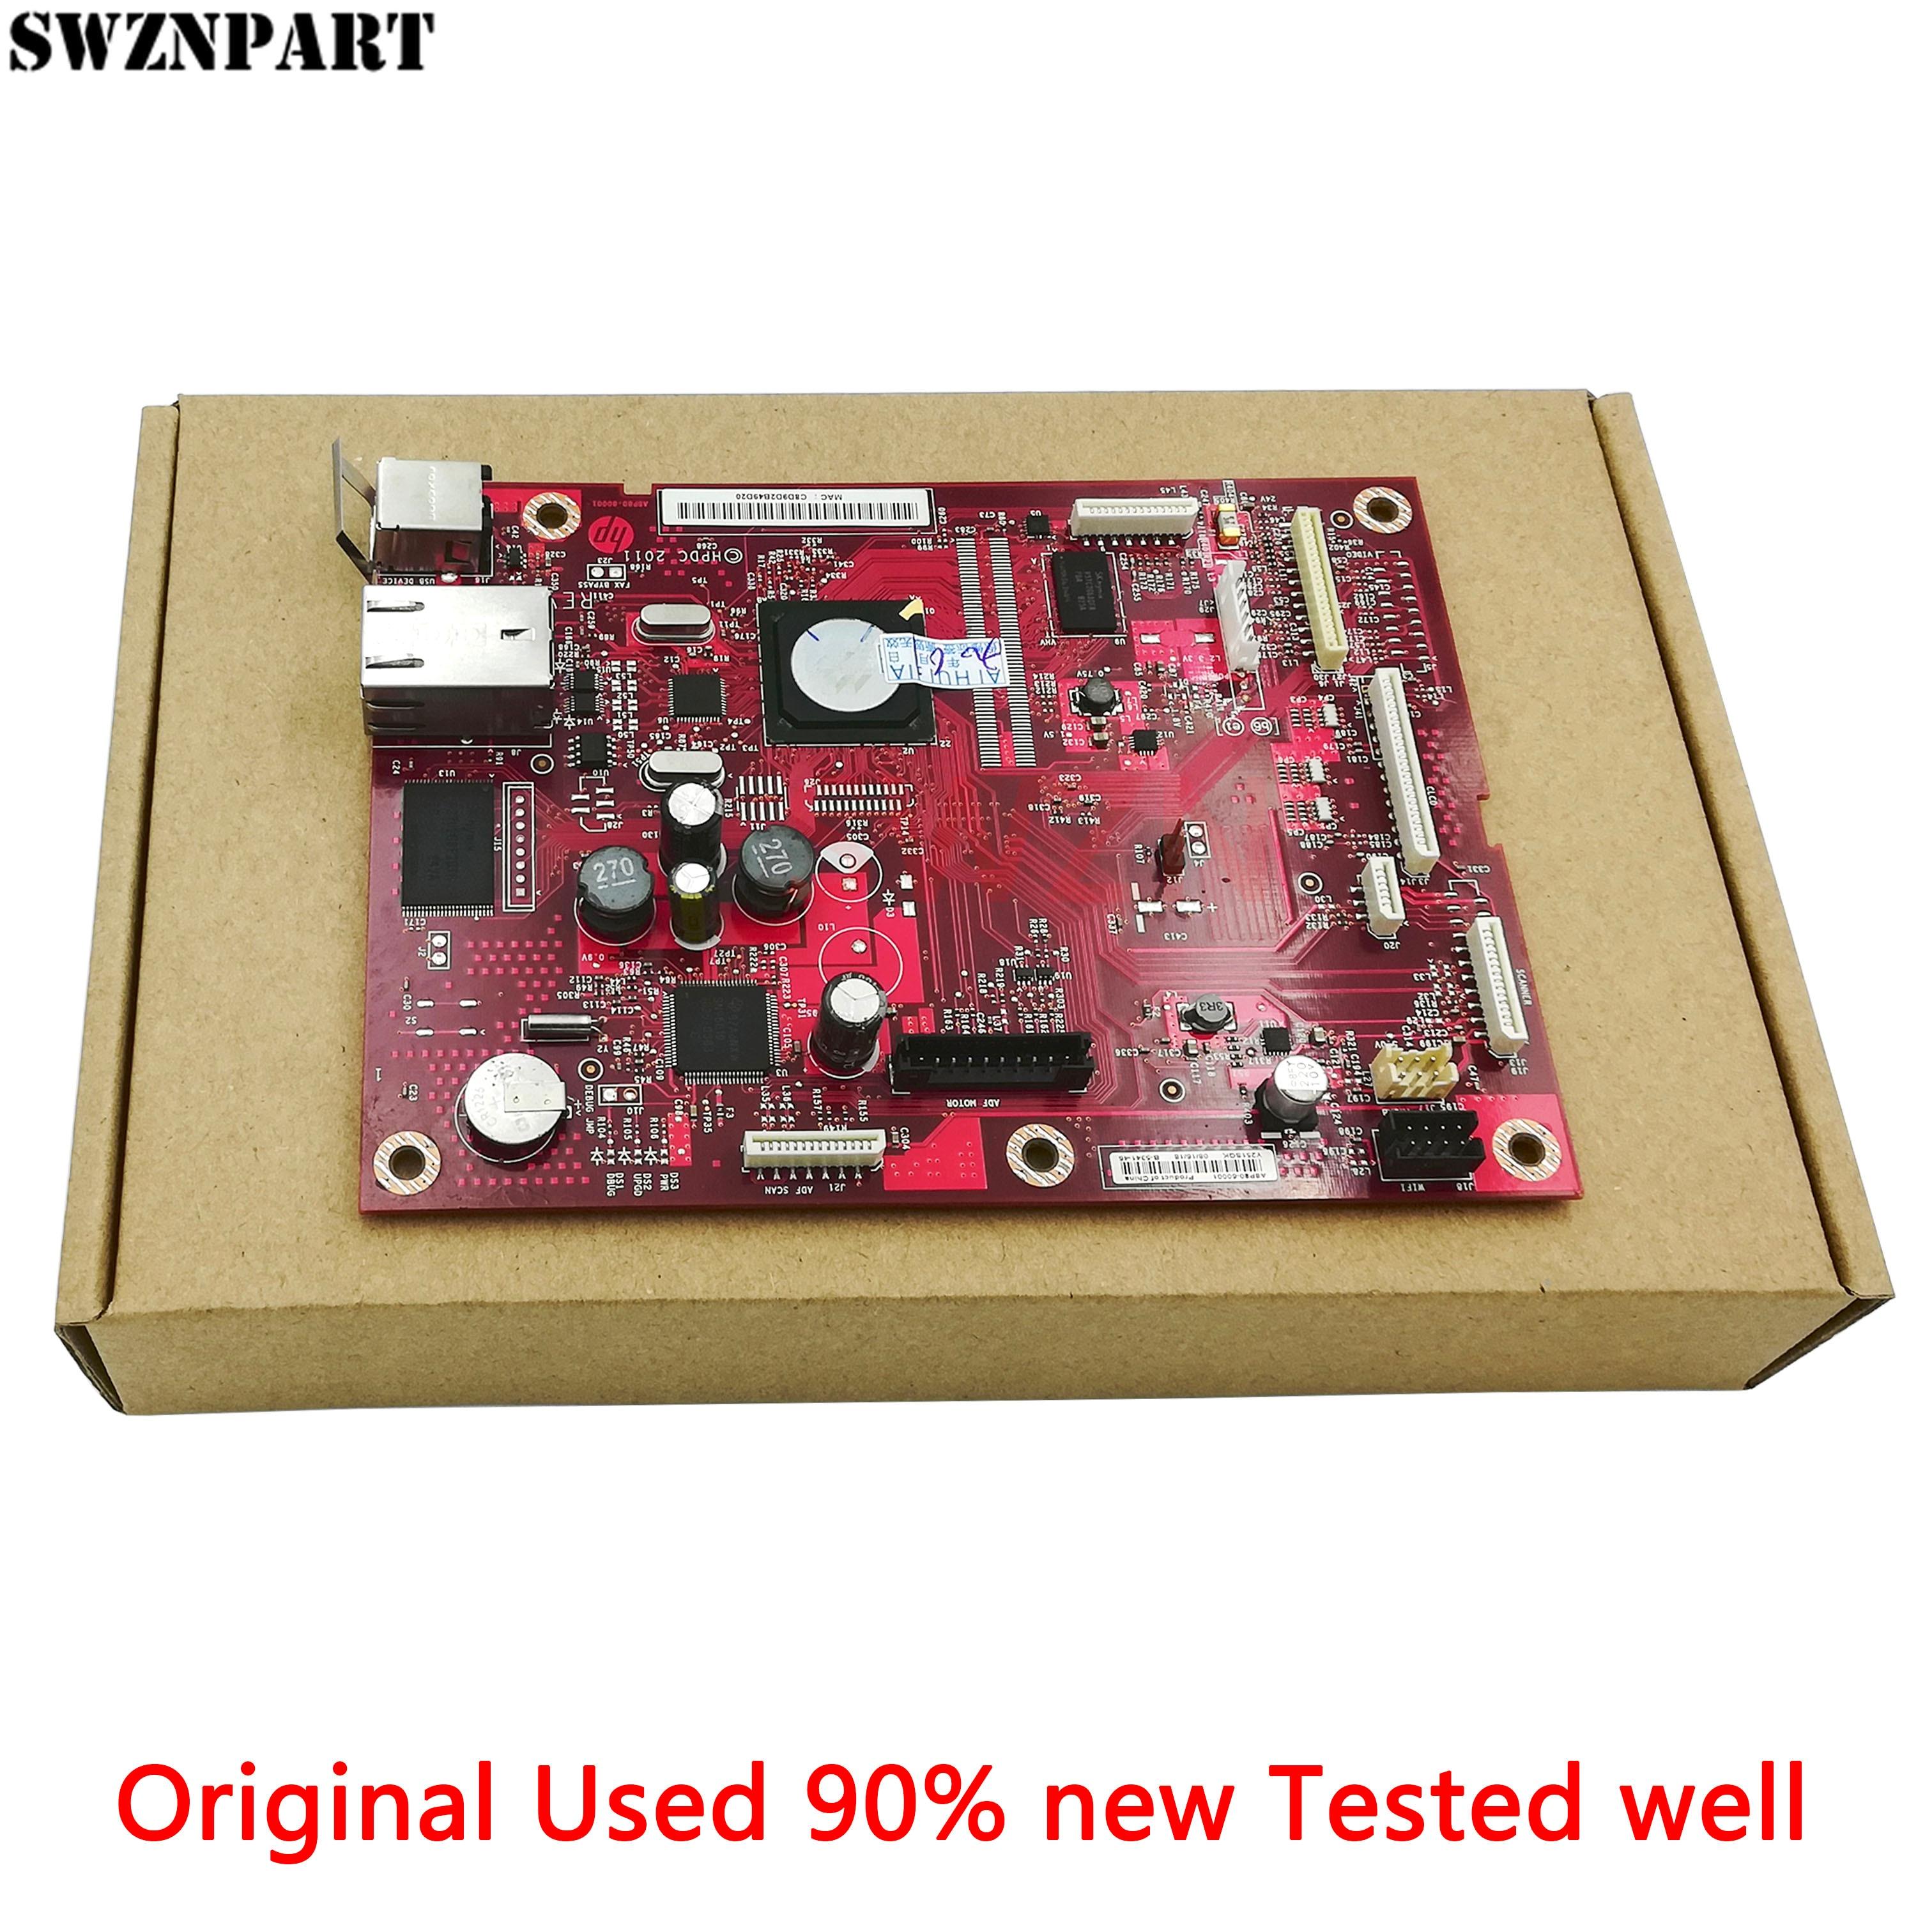 Placa formateadora formateador PCA ASSY placa madre de Tablero Principal lógica para HP Laserjet Pro MFP M521DN 521 M521DW A8P80-60001